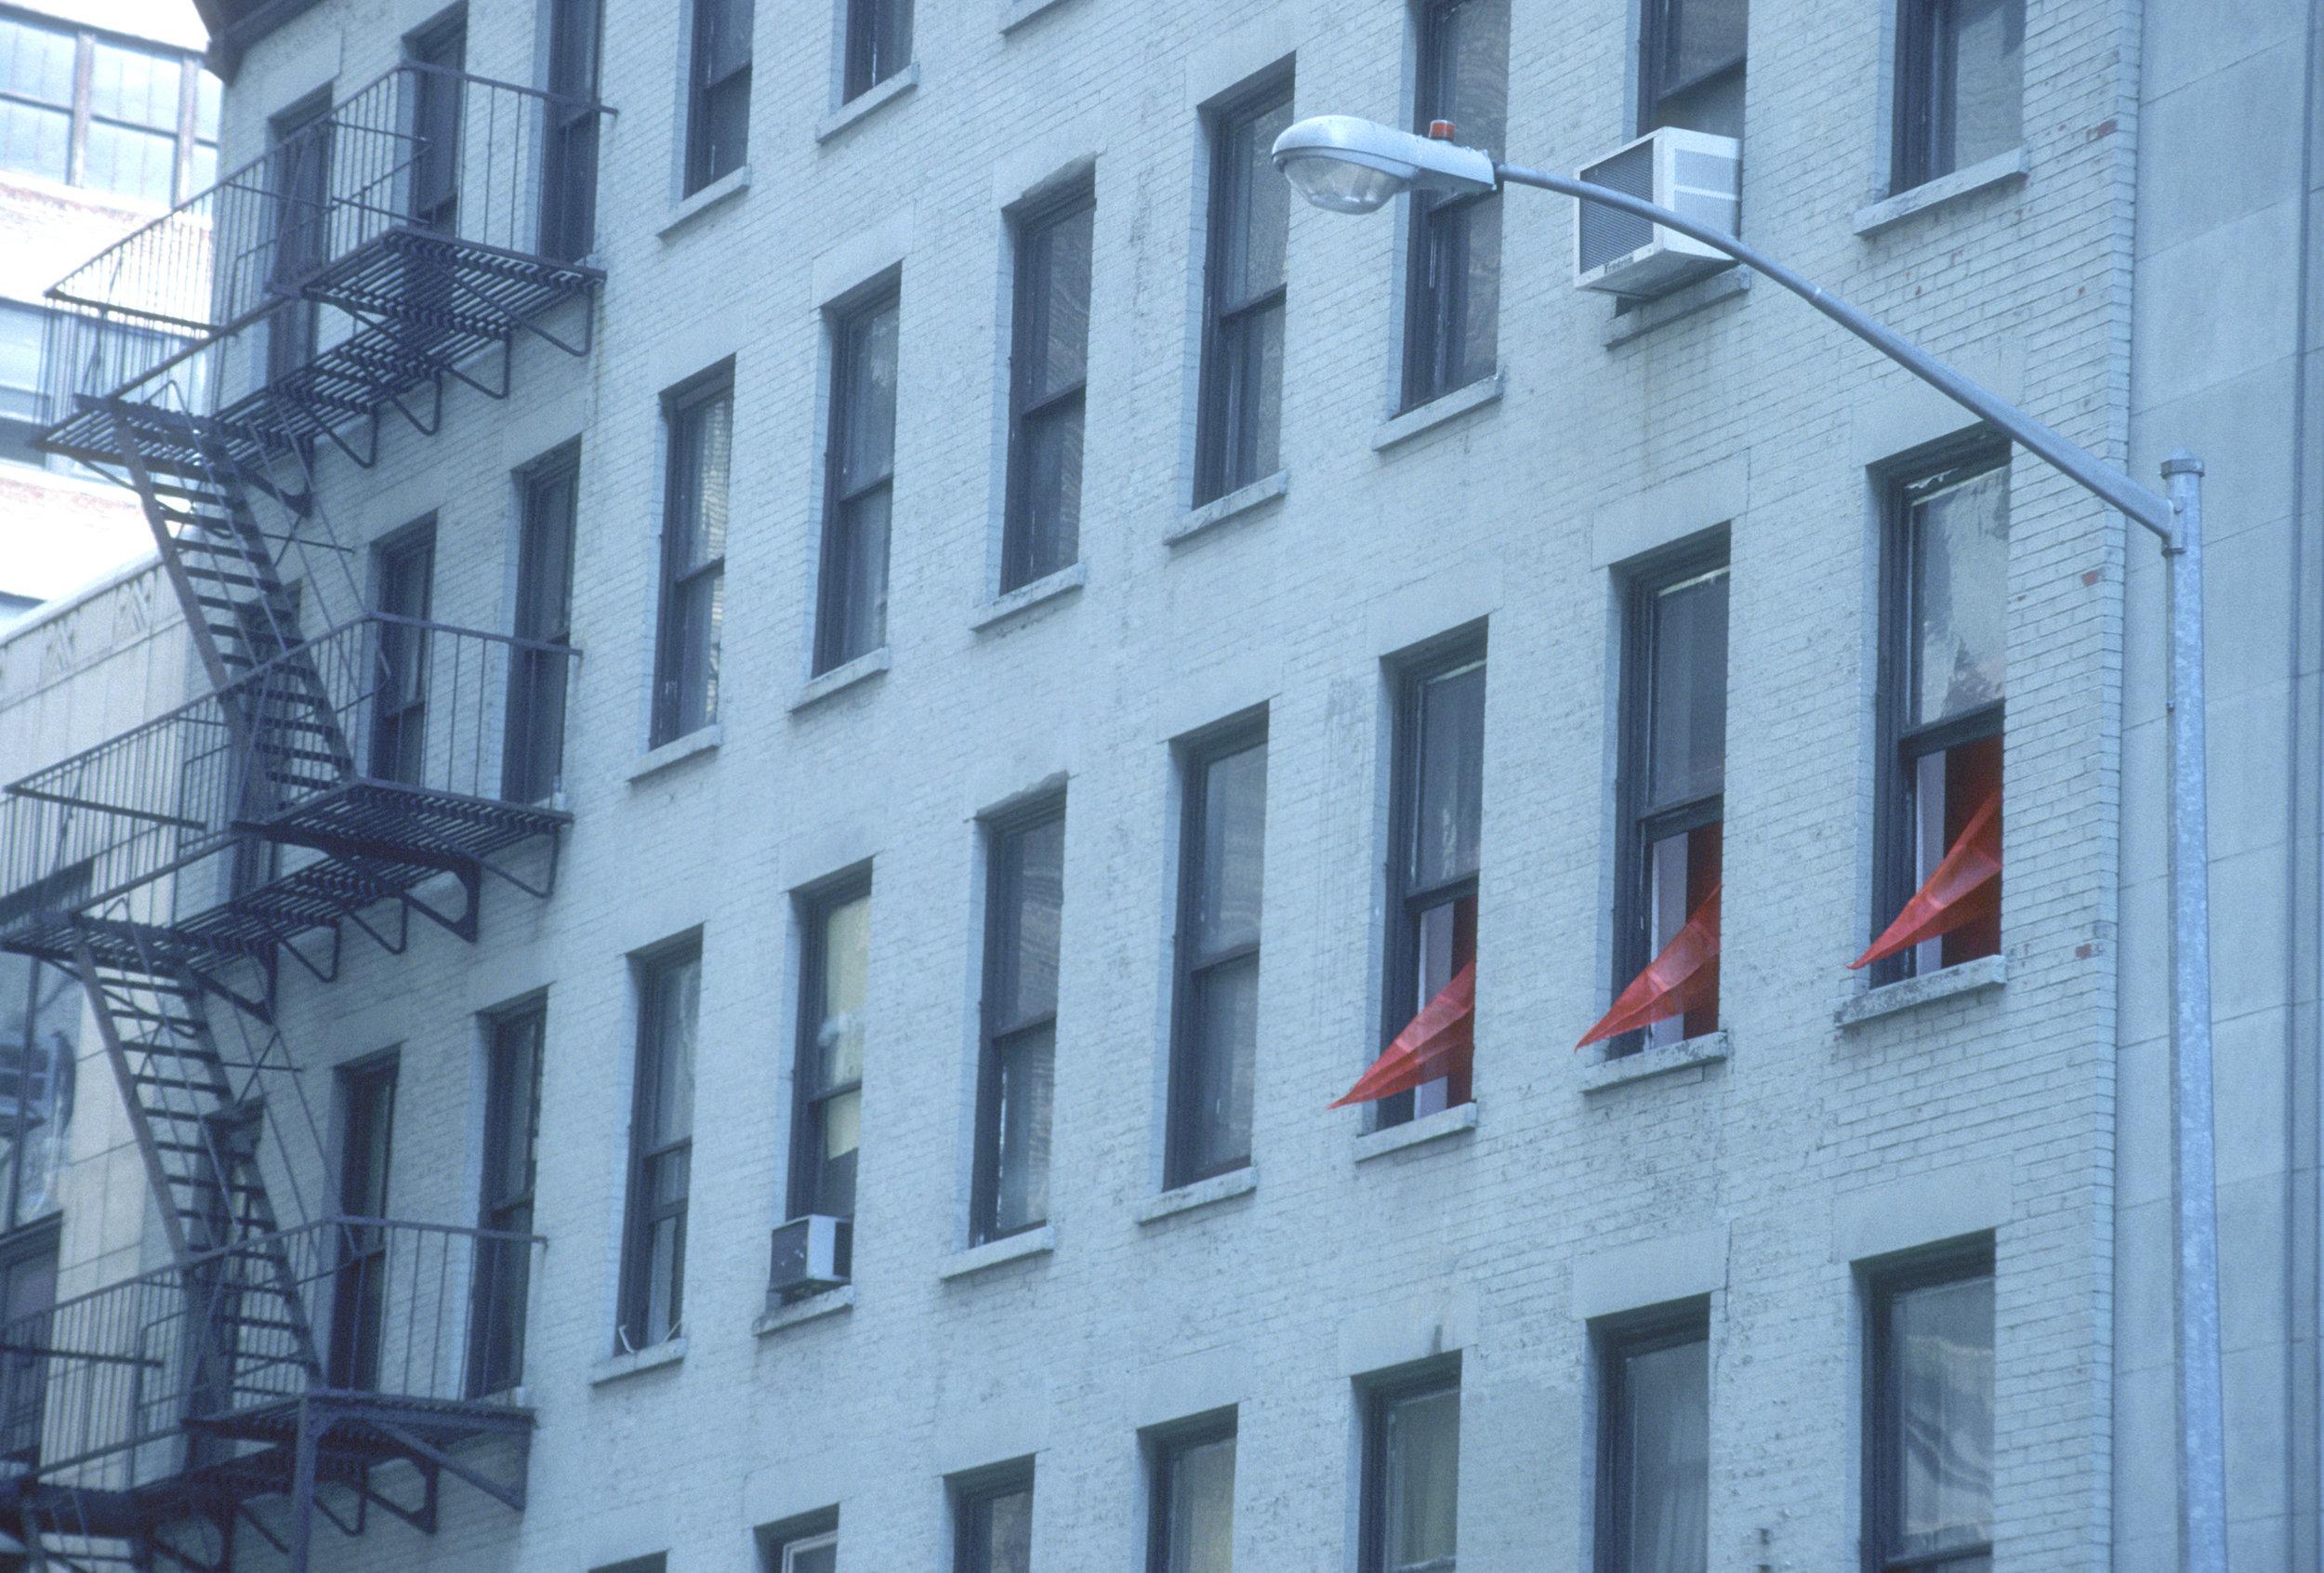 RED SPIKES ON 29TH STREET_Echelman_PhotoStudioEchelman_0007.jpg